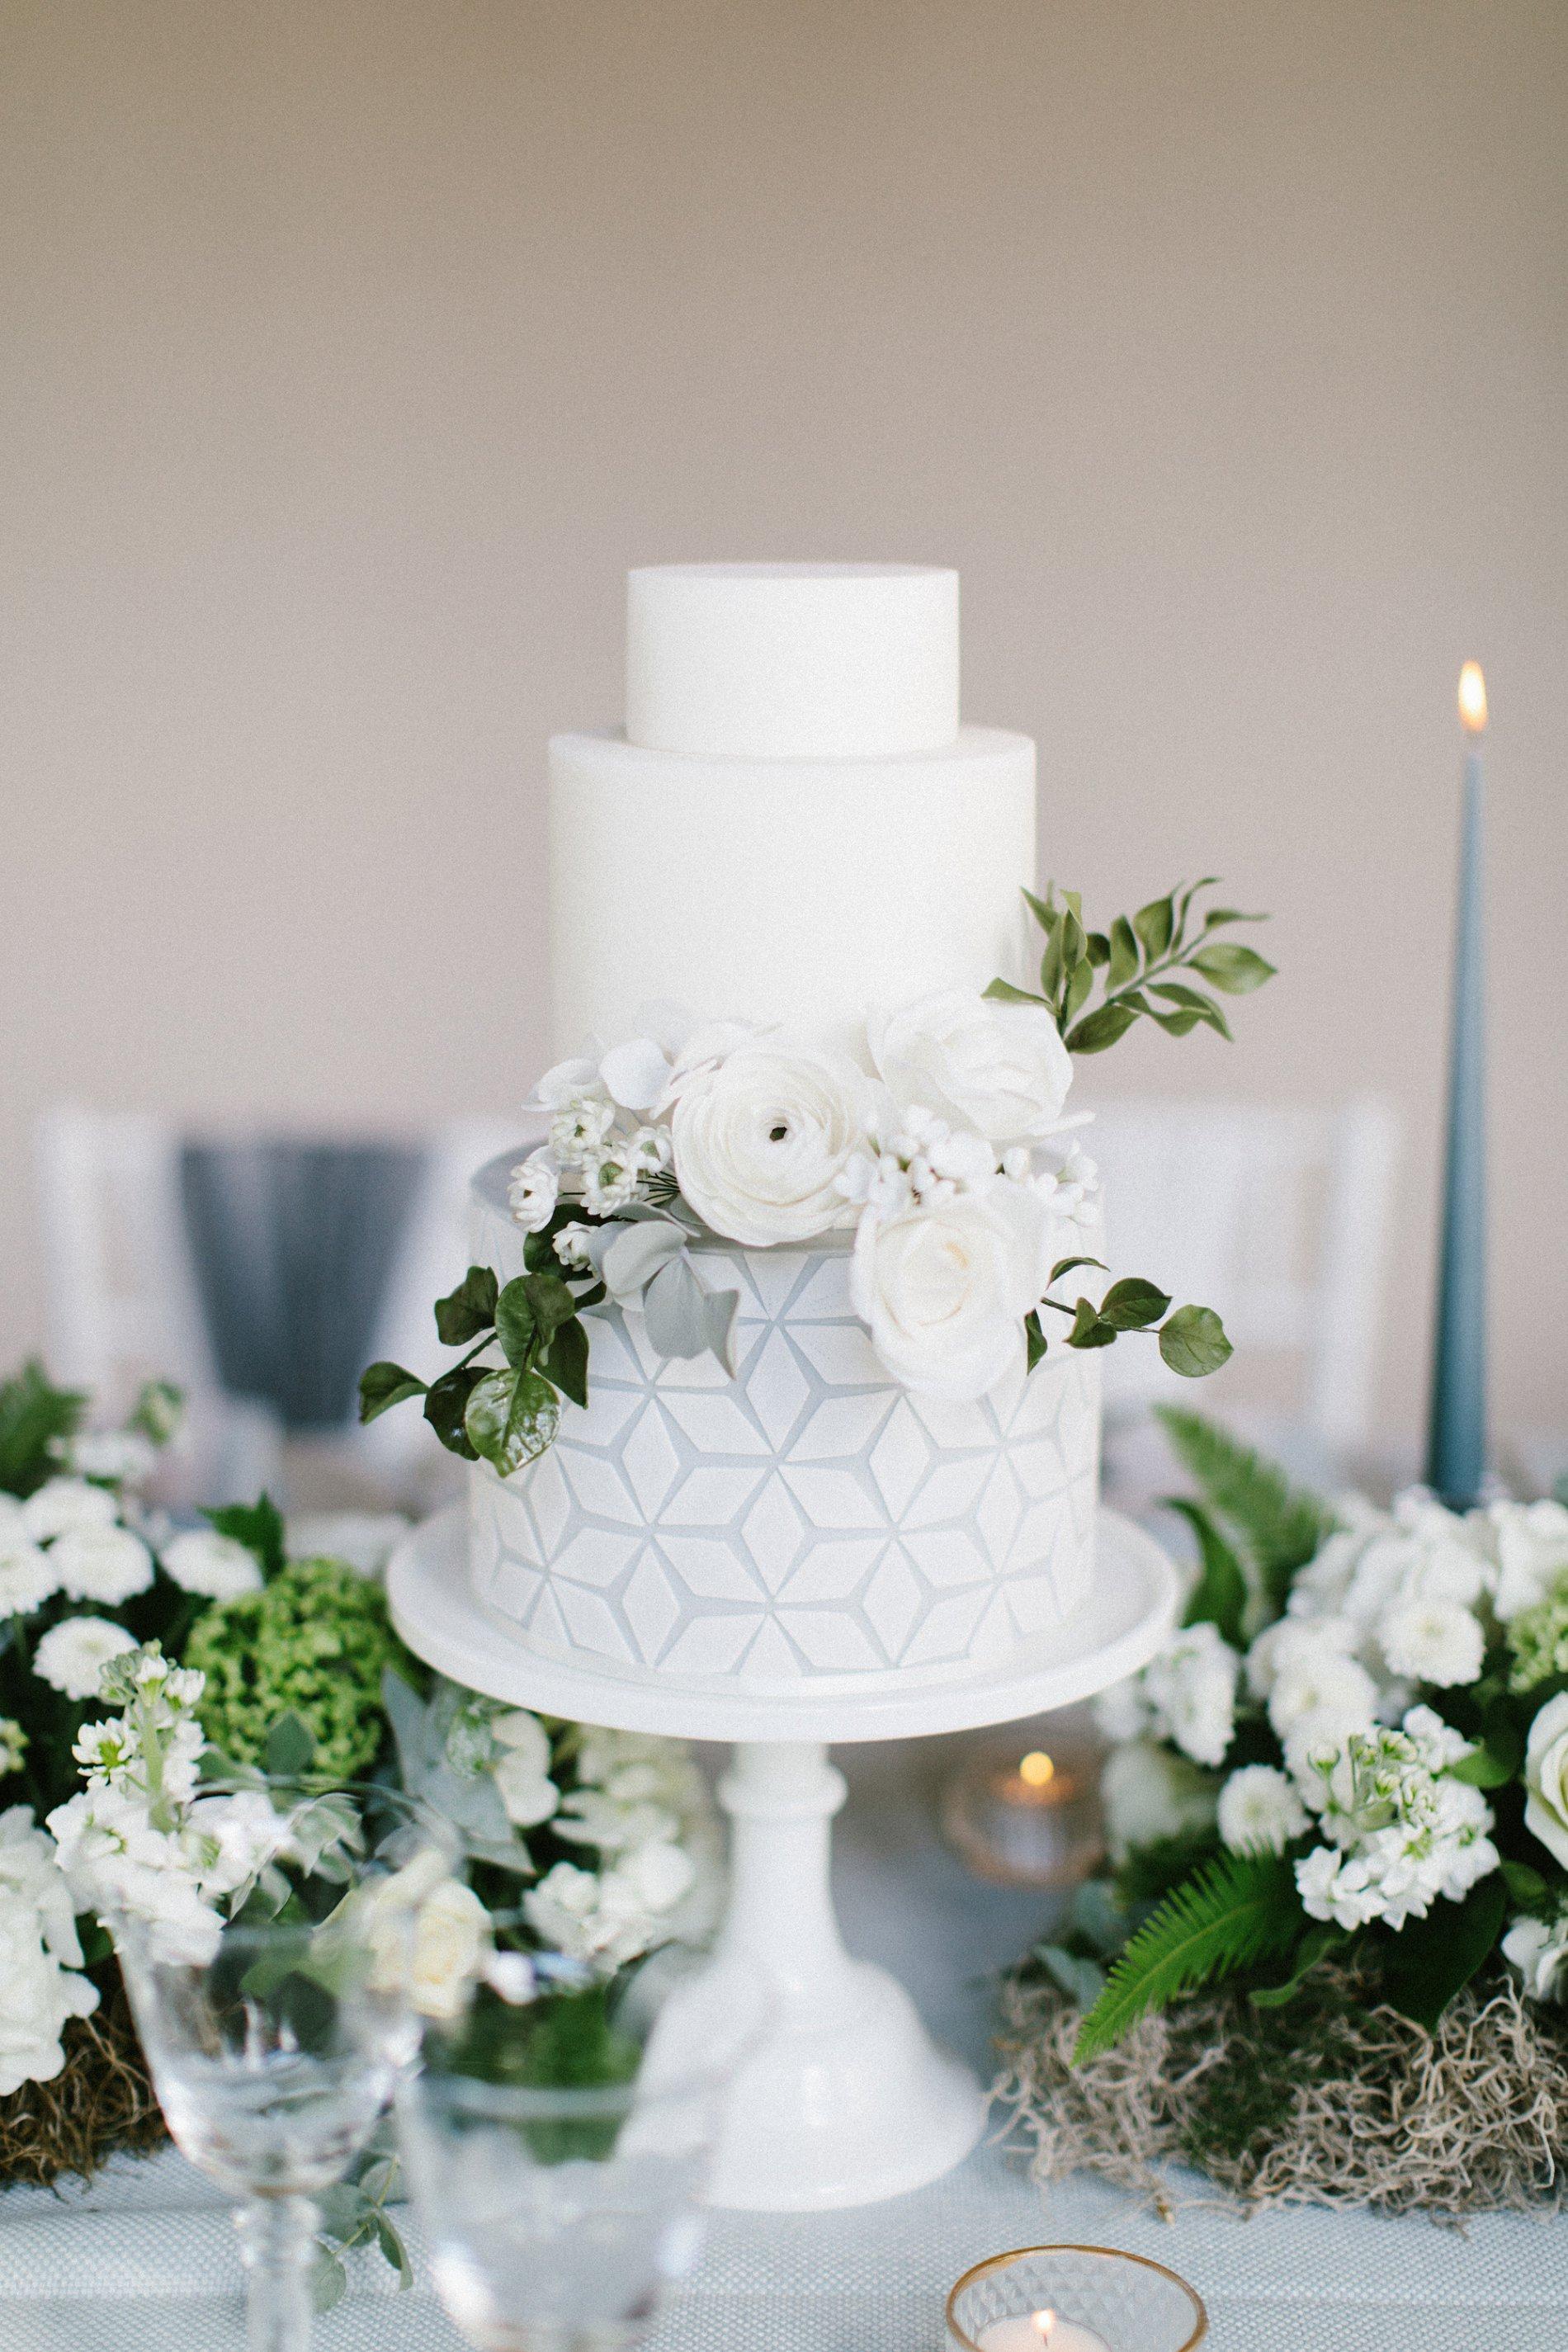 An Intimate Fine Art Wedding Shoot at Newby Hall (c) Melissa Beattie Photography (22)